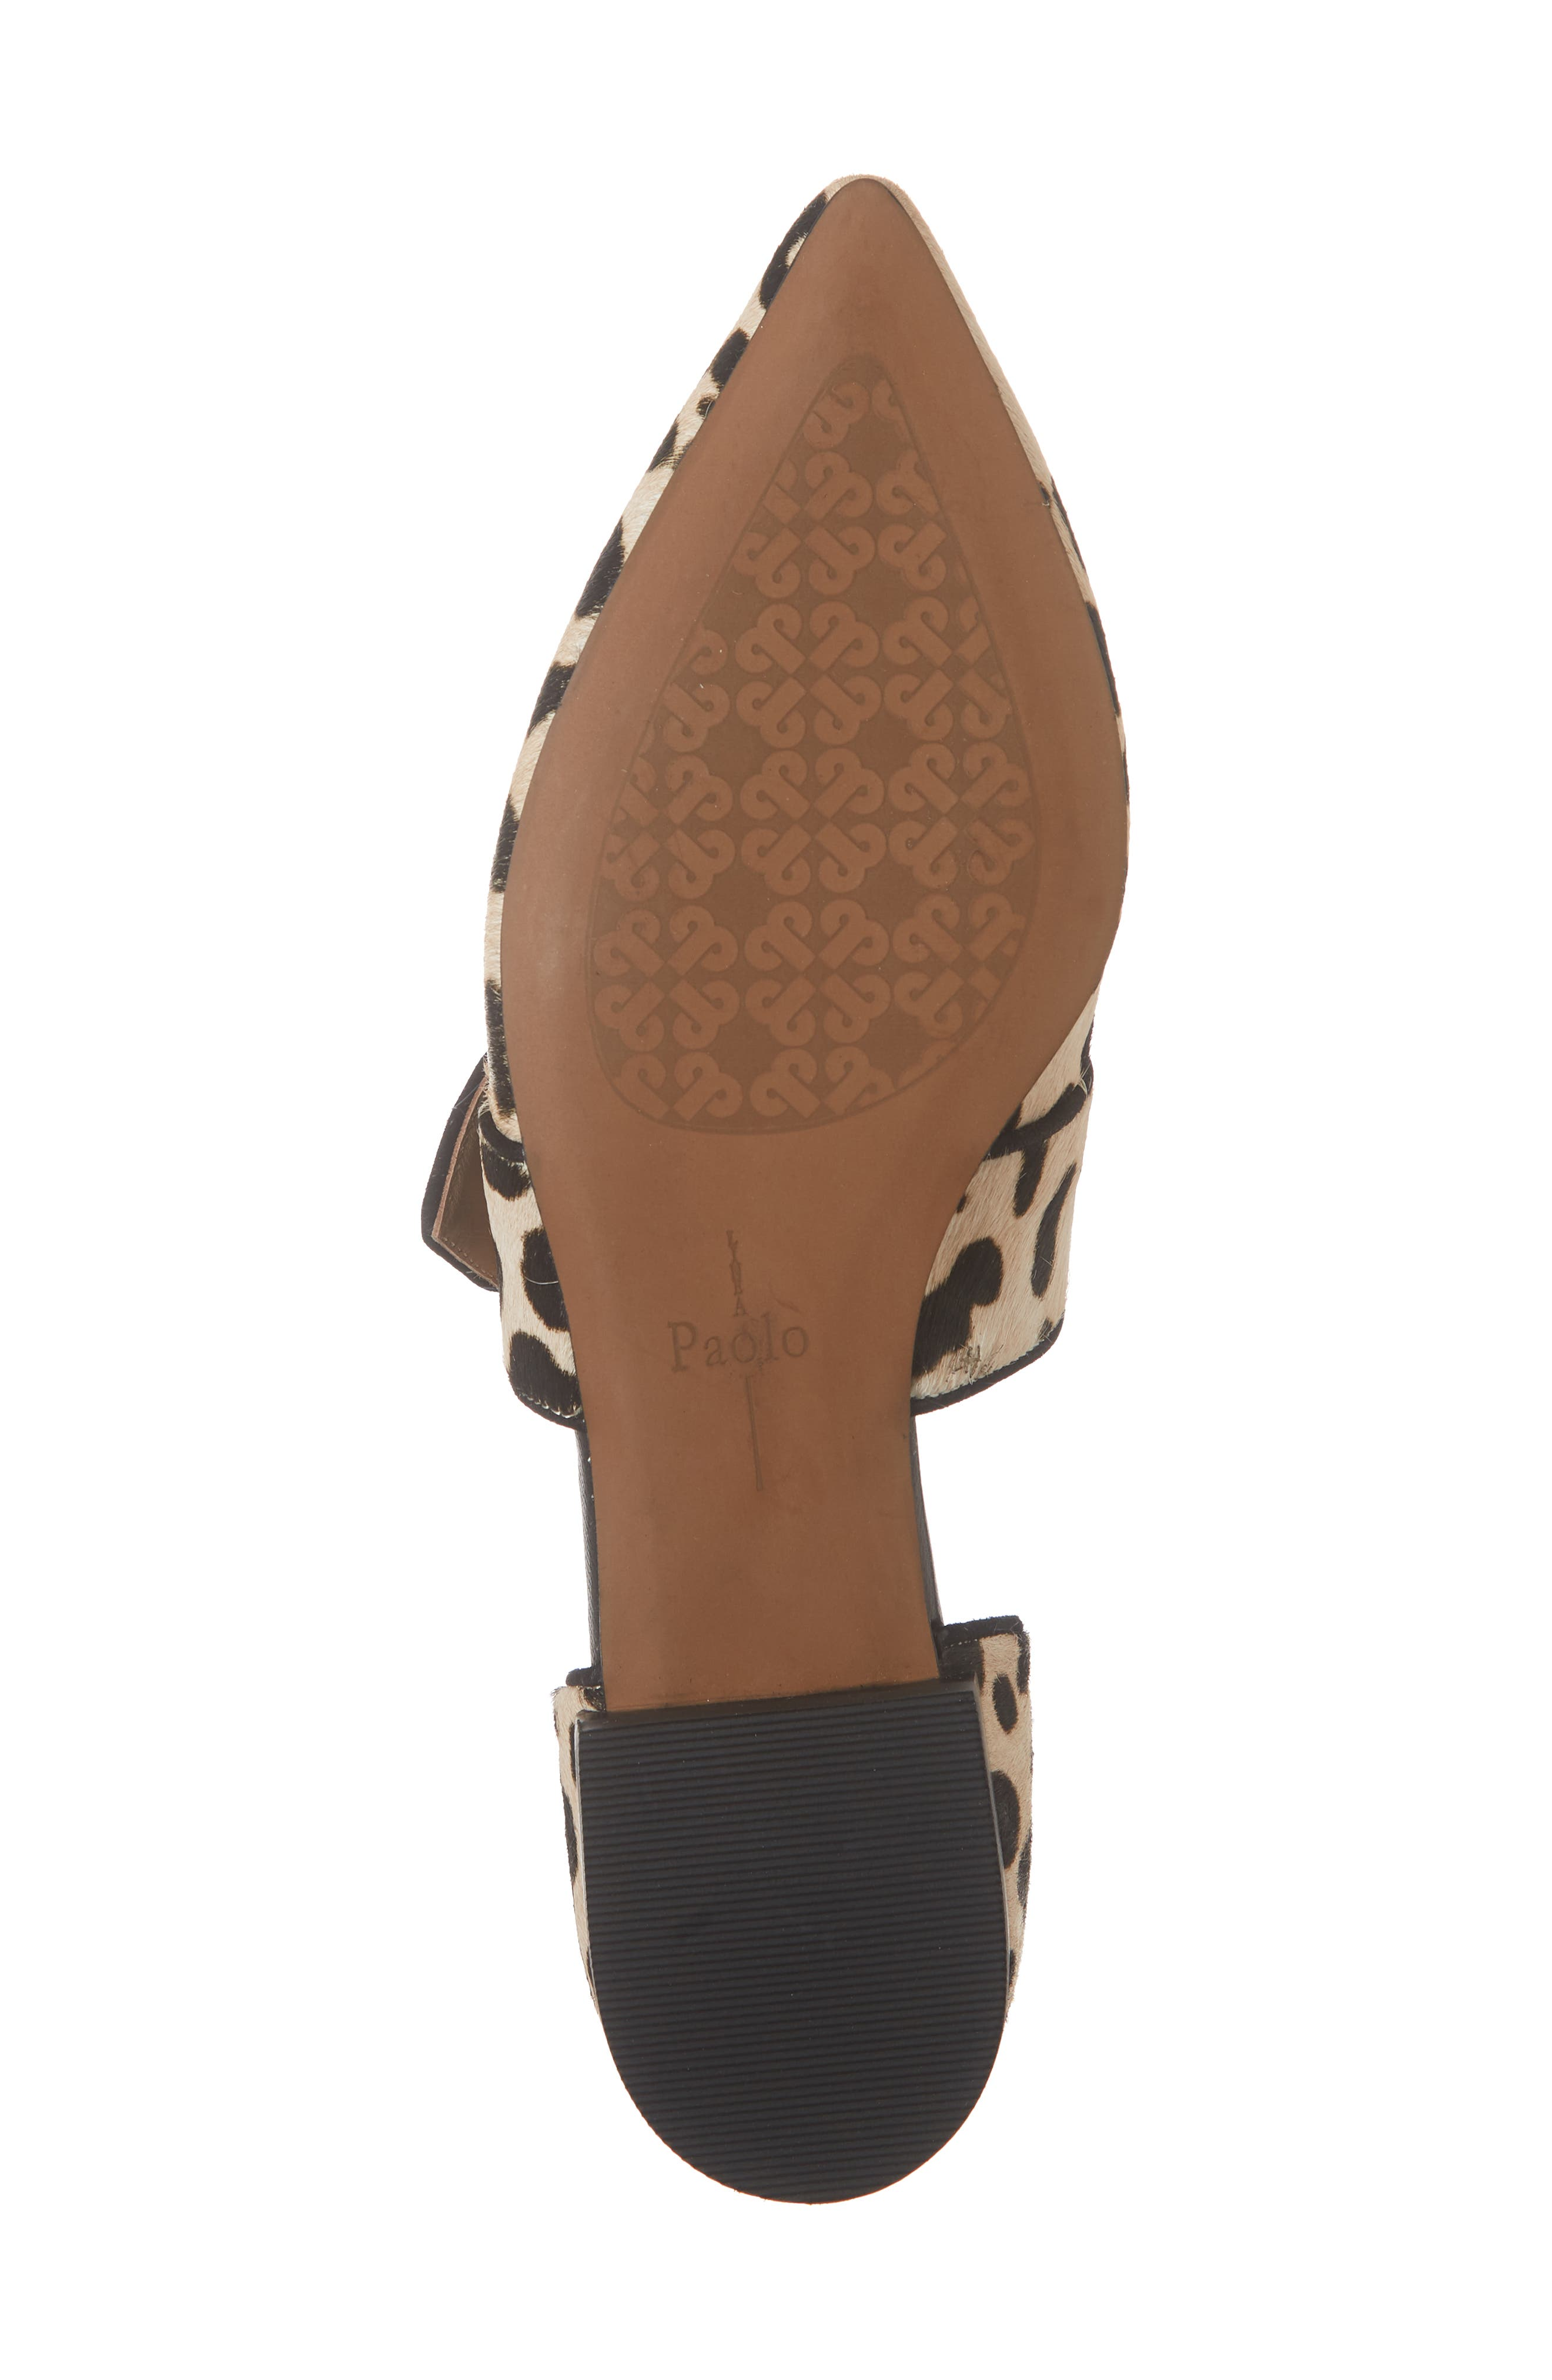 LINEA PAOLO, Dean Pointy Toe Flat, Alternate thumbnail 6, color, WHITE/ BLACK PRINT HAIRCALF